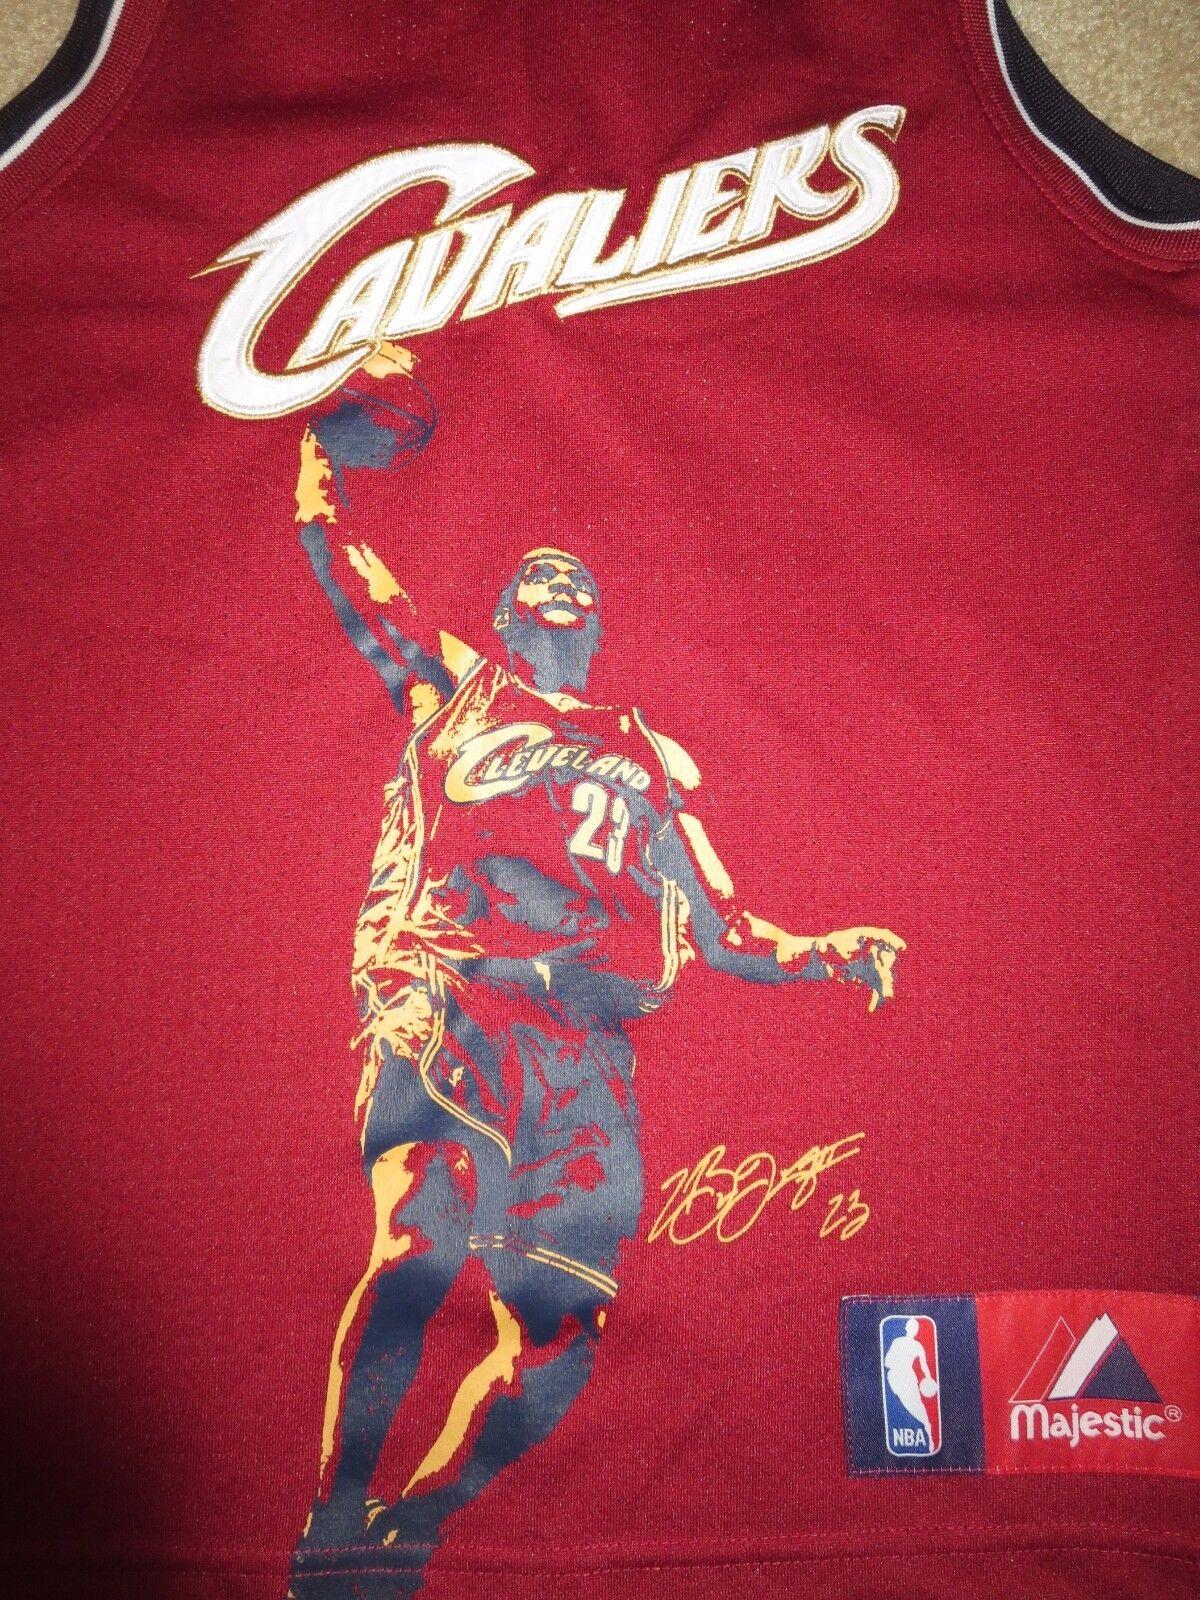 Lebron James  23 Cleveland Kavaliere NBA Finals Trikot Trikot Trikot Jugendliche M 10-12 Kind 5c0461